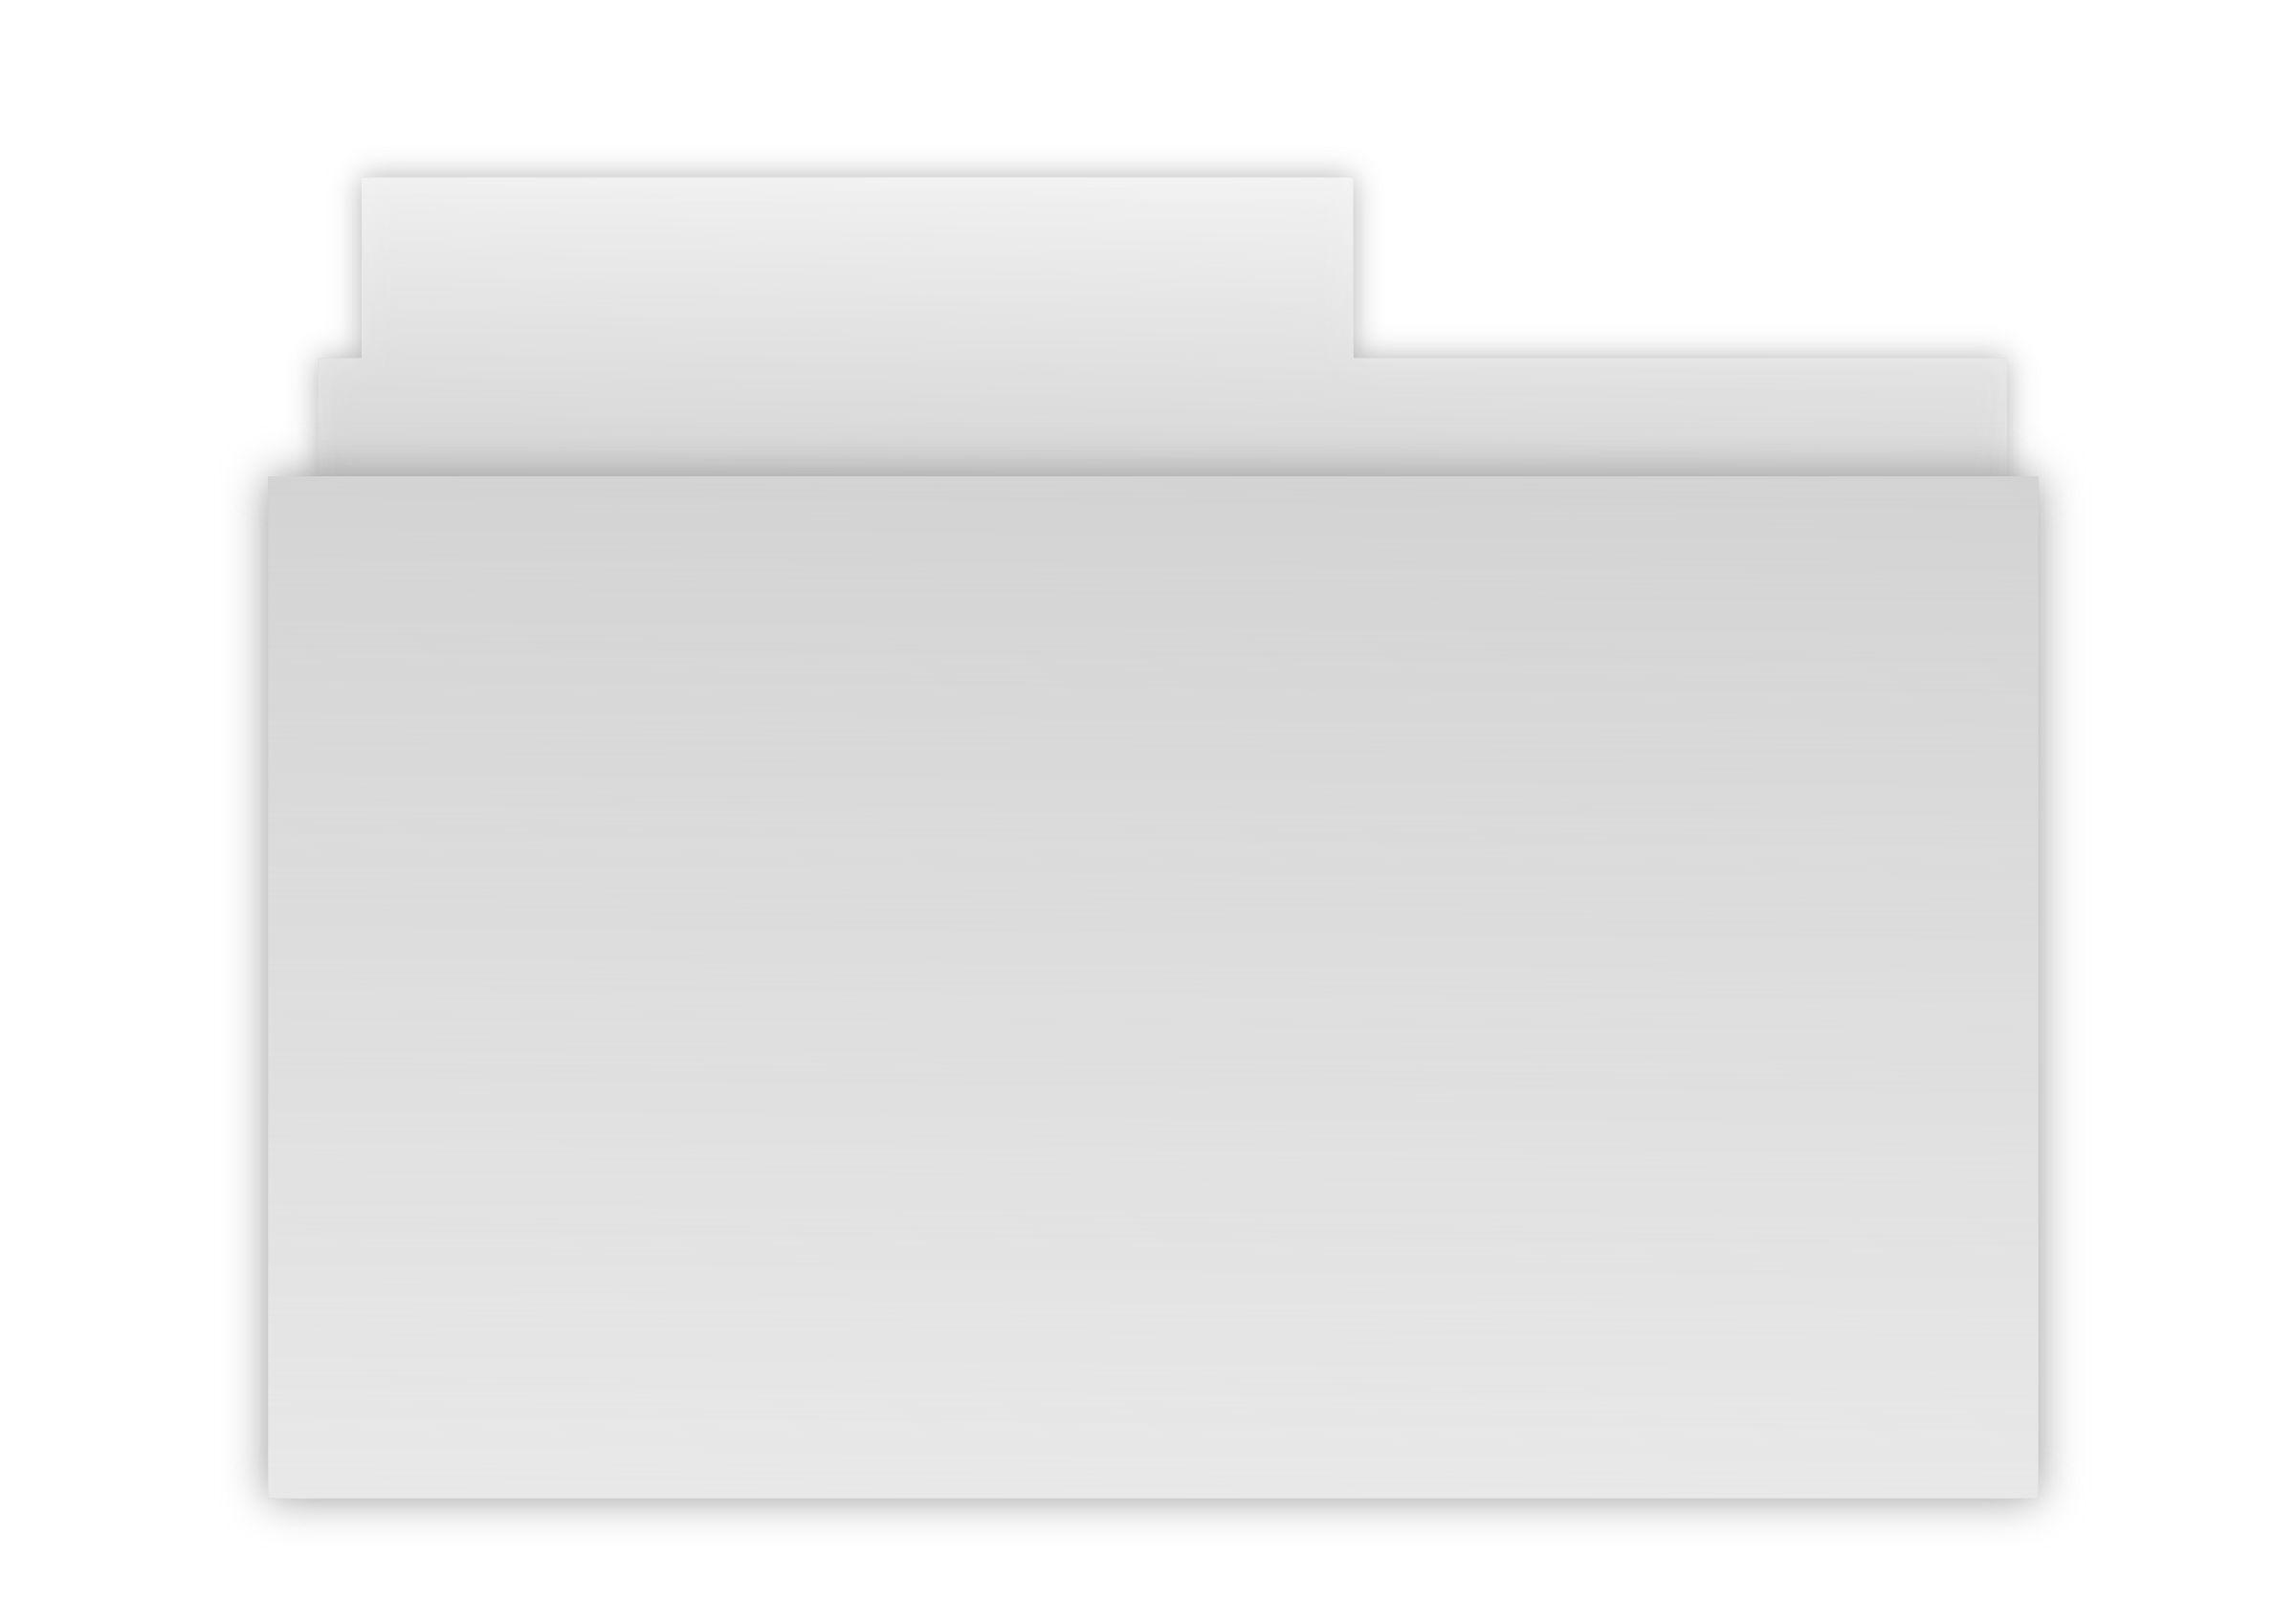 Gray icons png free. Folder clipart bin